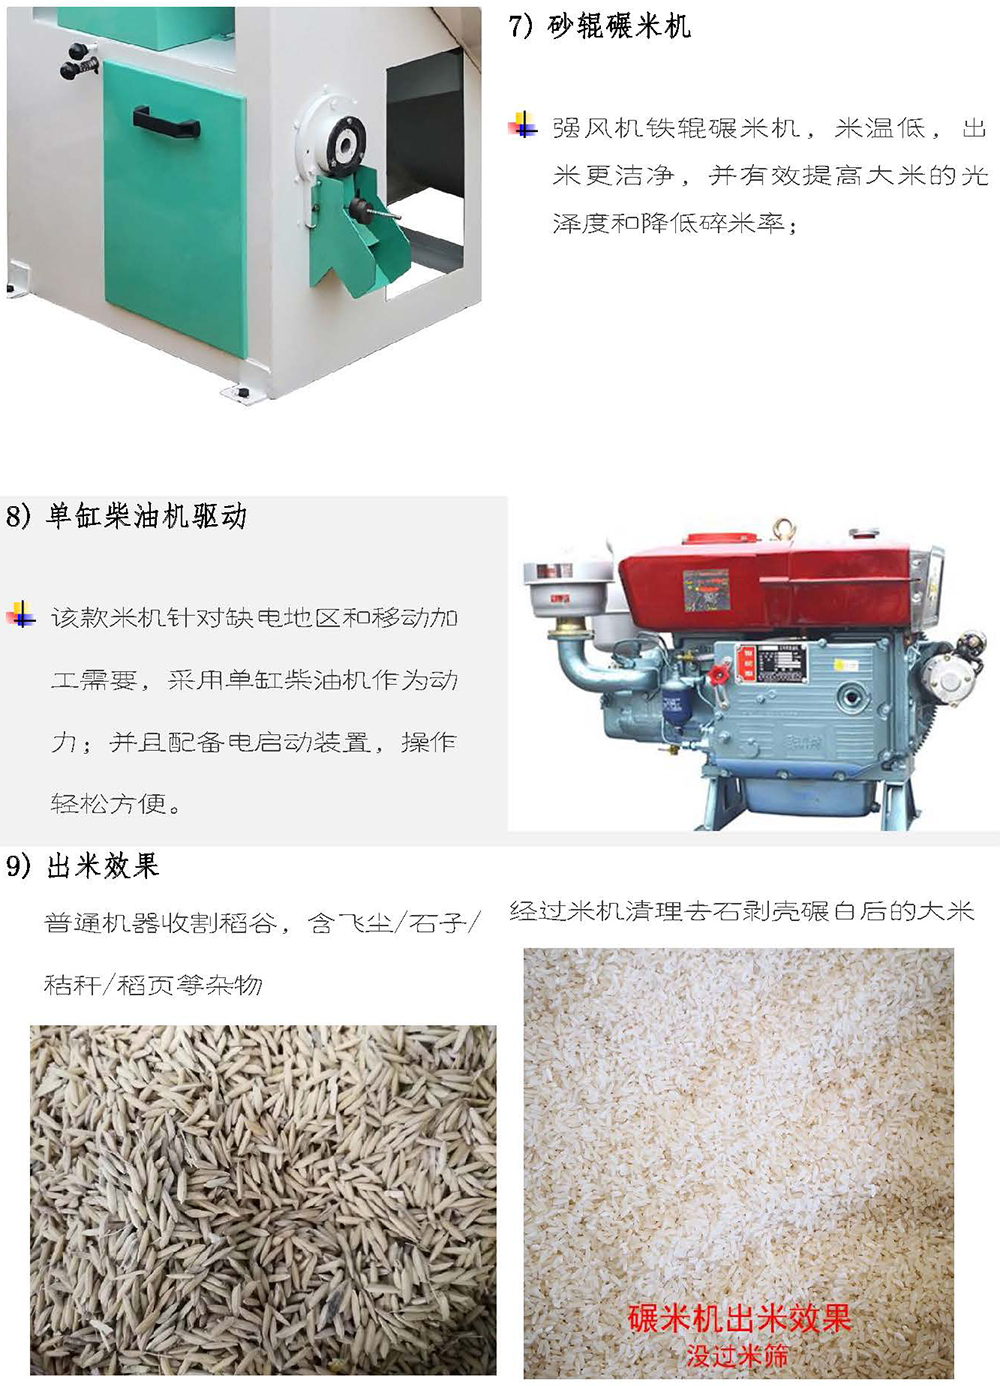 6LN-15-8.5SR礱碾組合米機-柴油機驅動-中文版_頁面_5